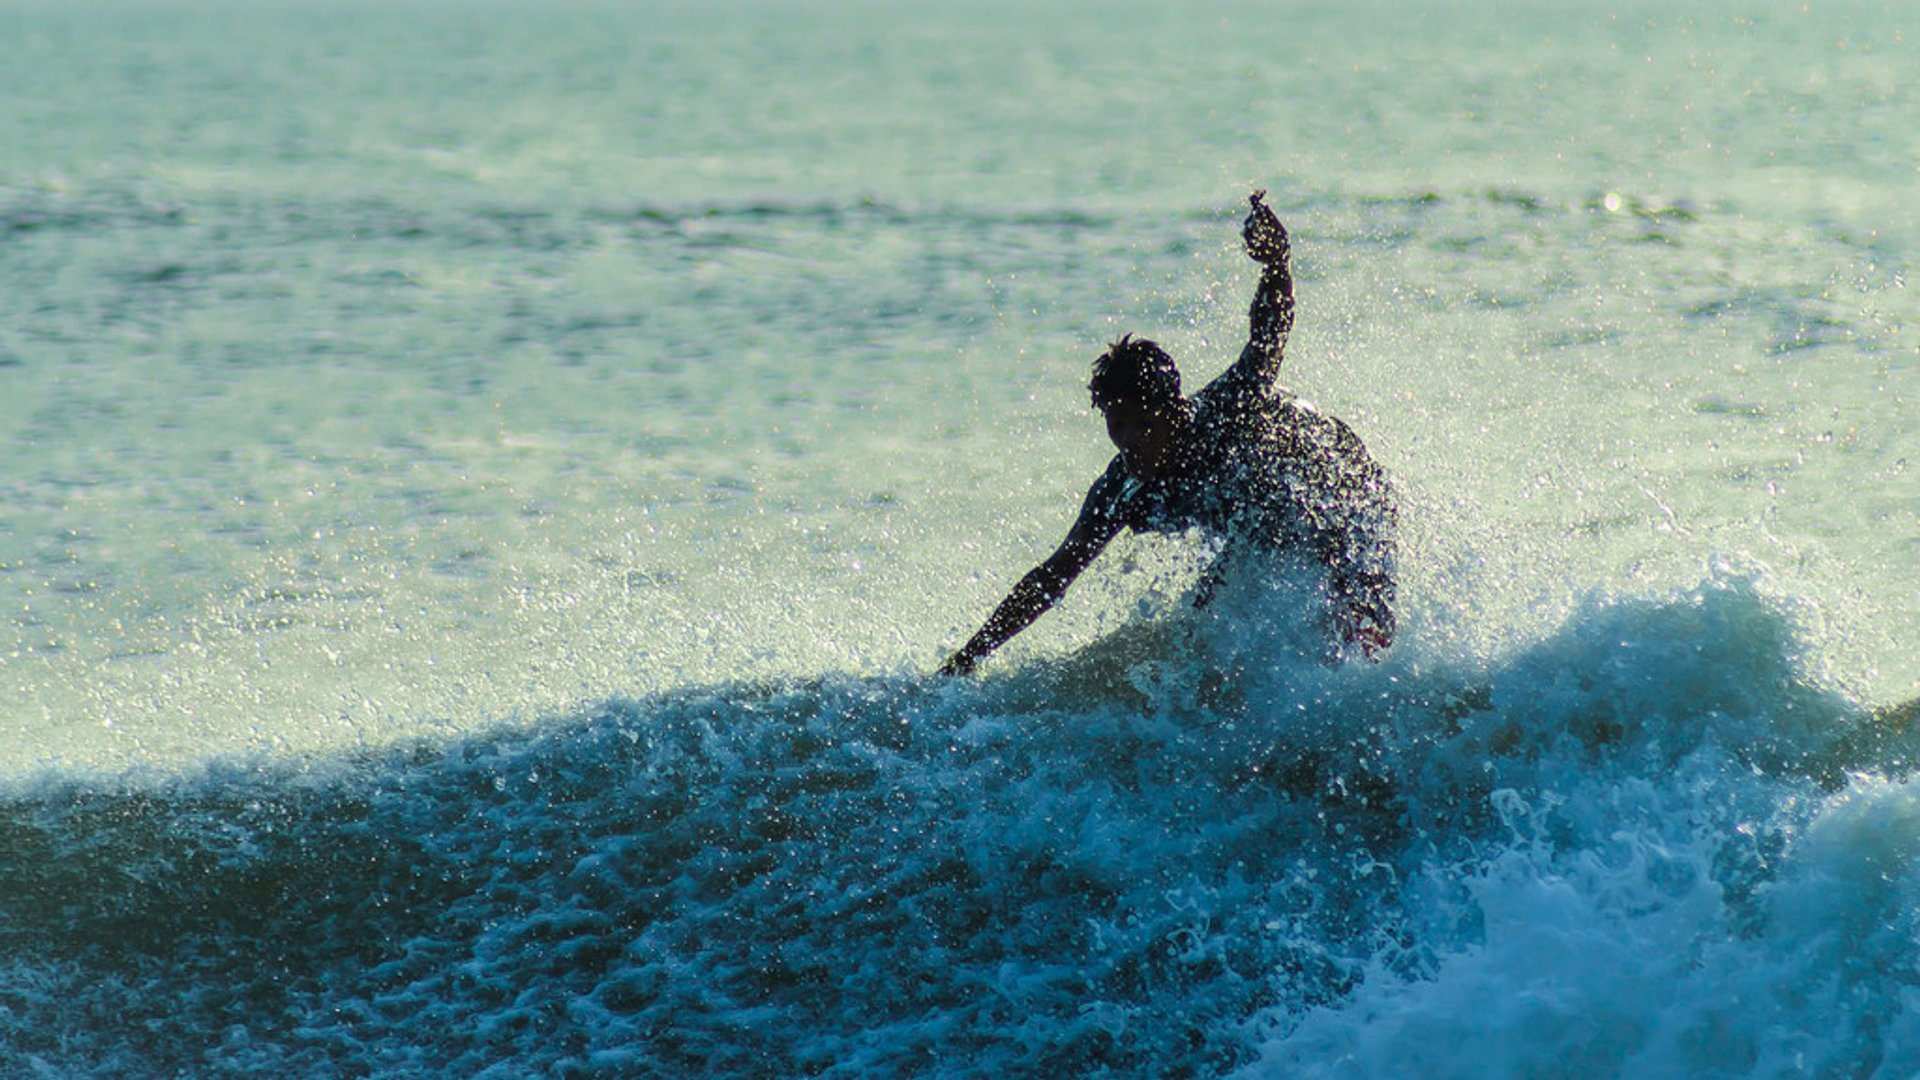 Surfing in India - Best Season 2020